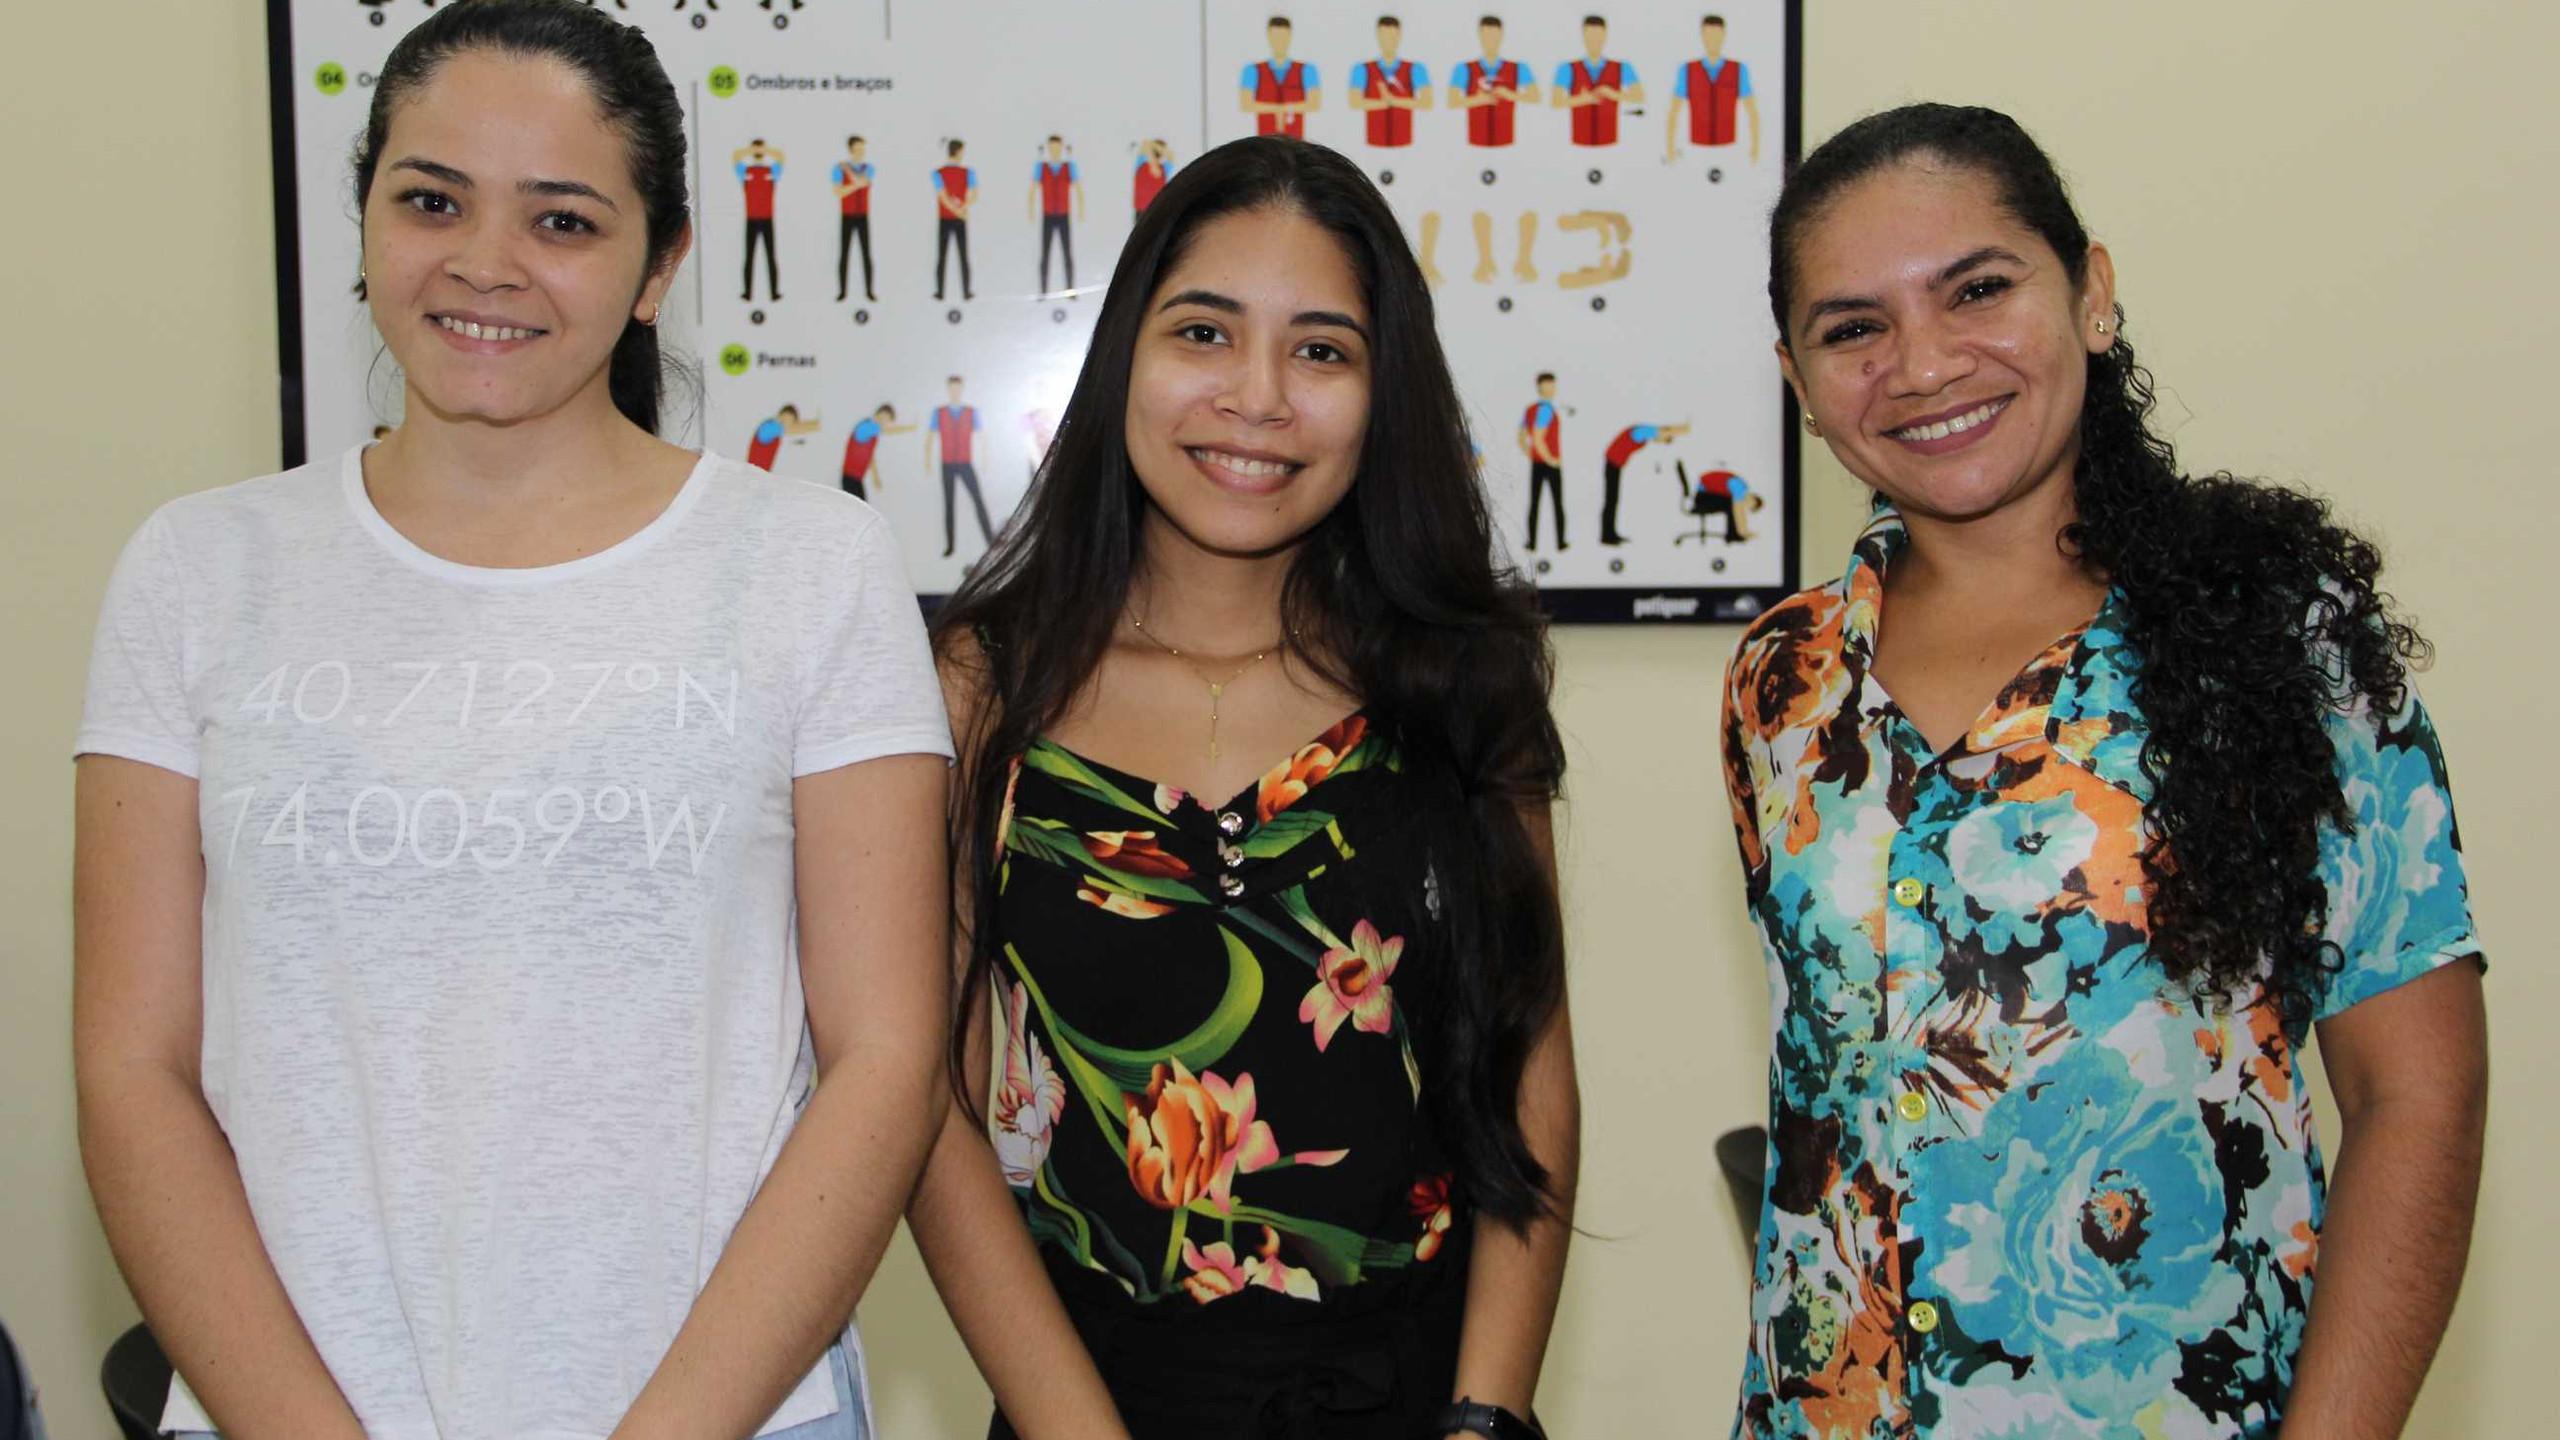 Cristiane Cunha, Maryluce Lima e Maria Nascimento.